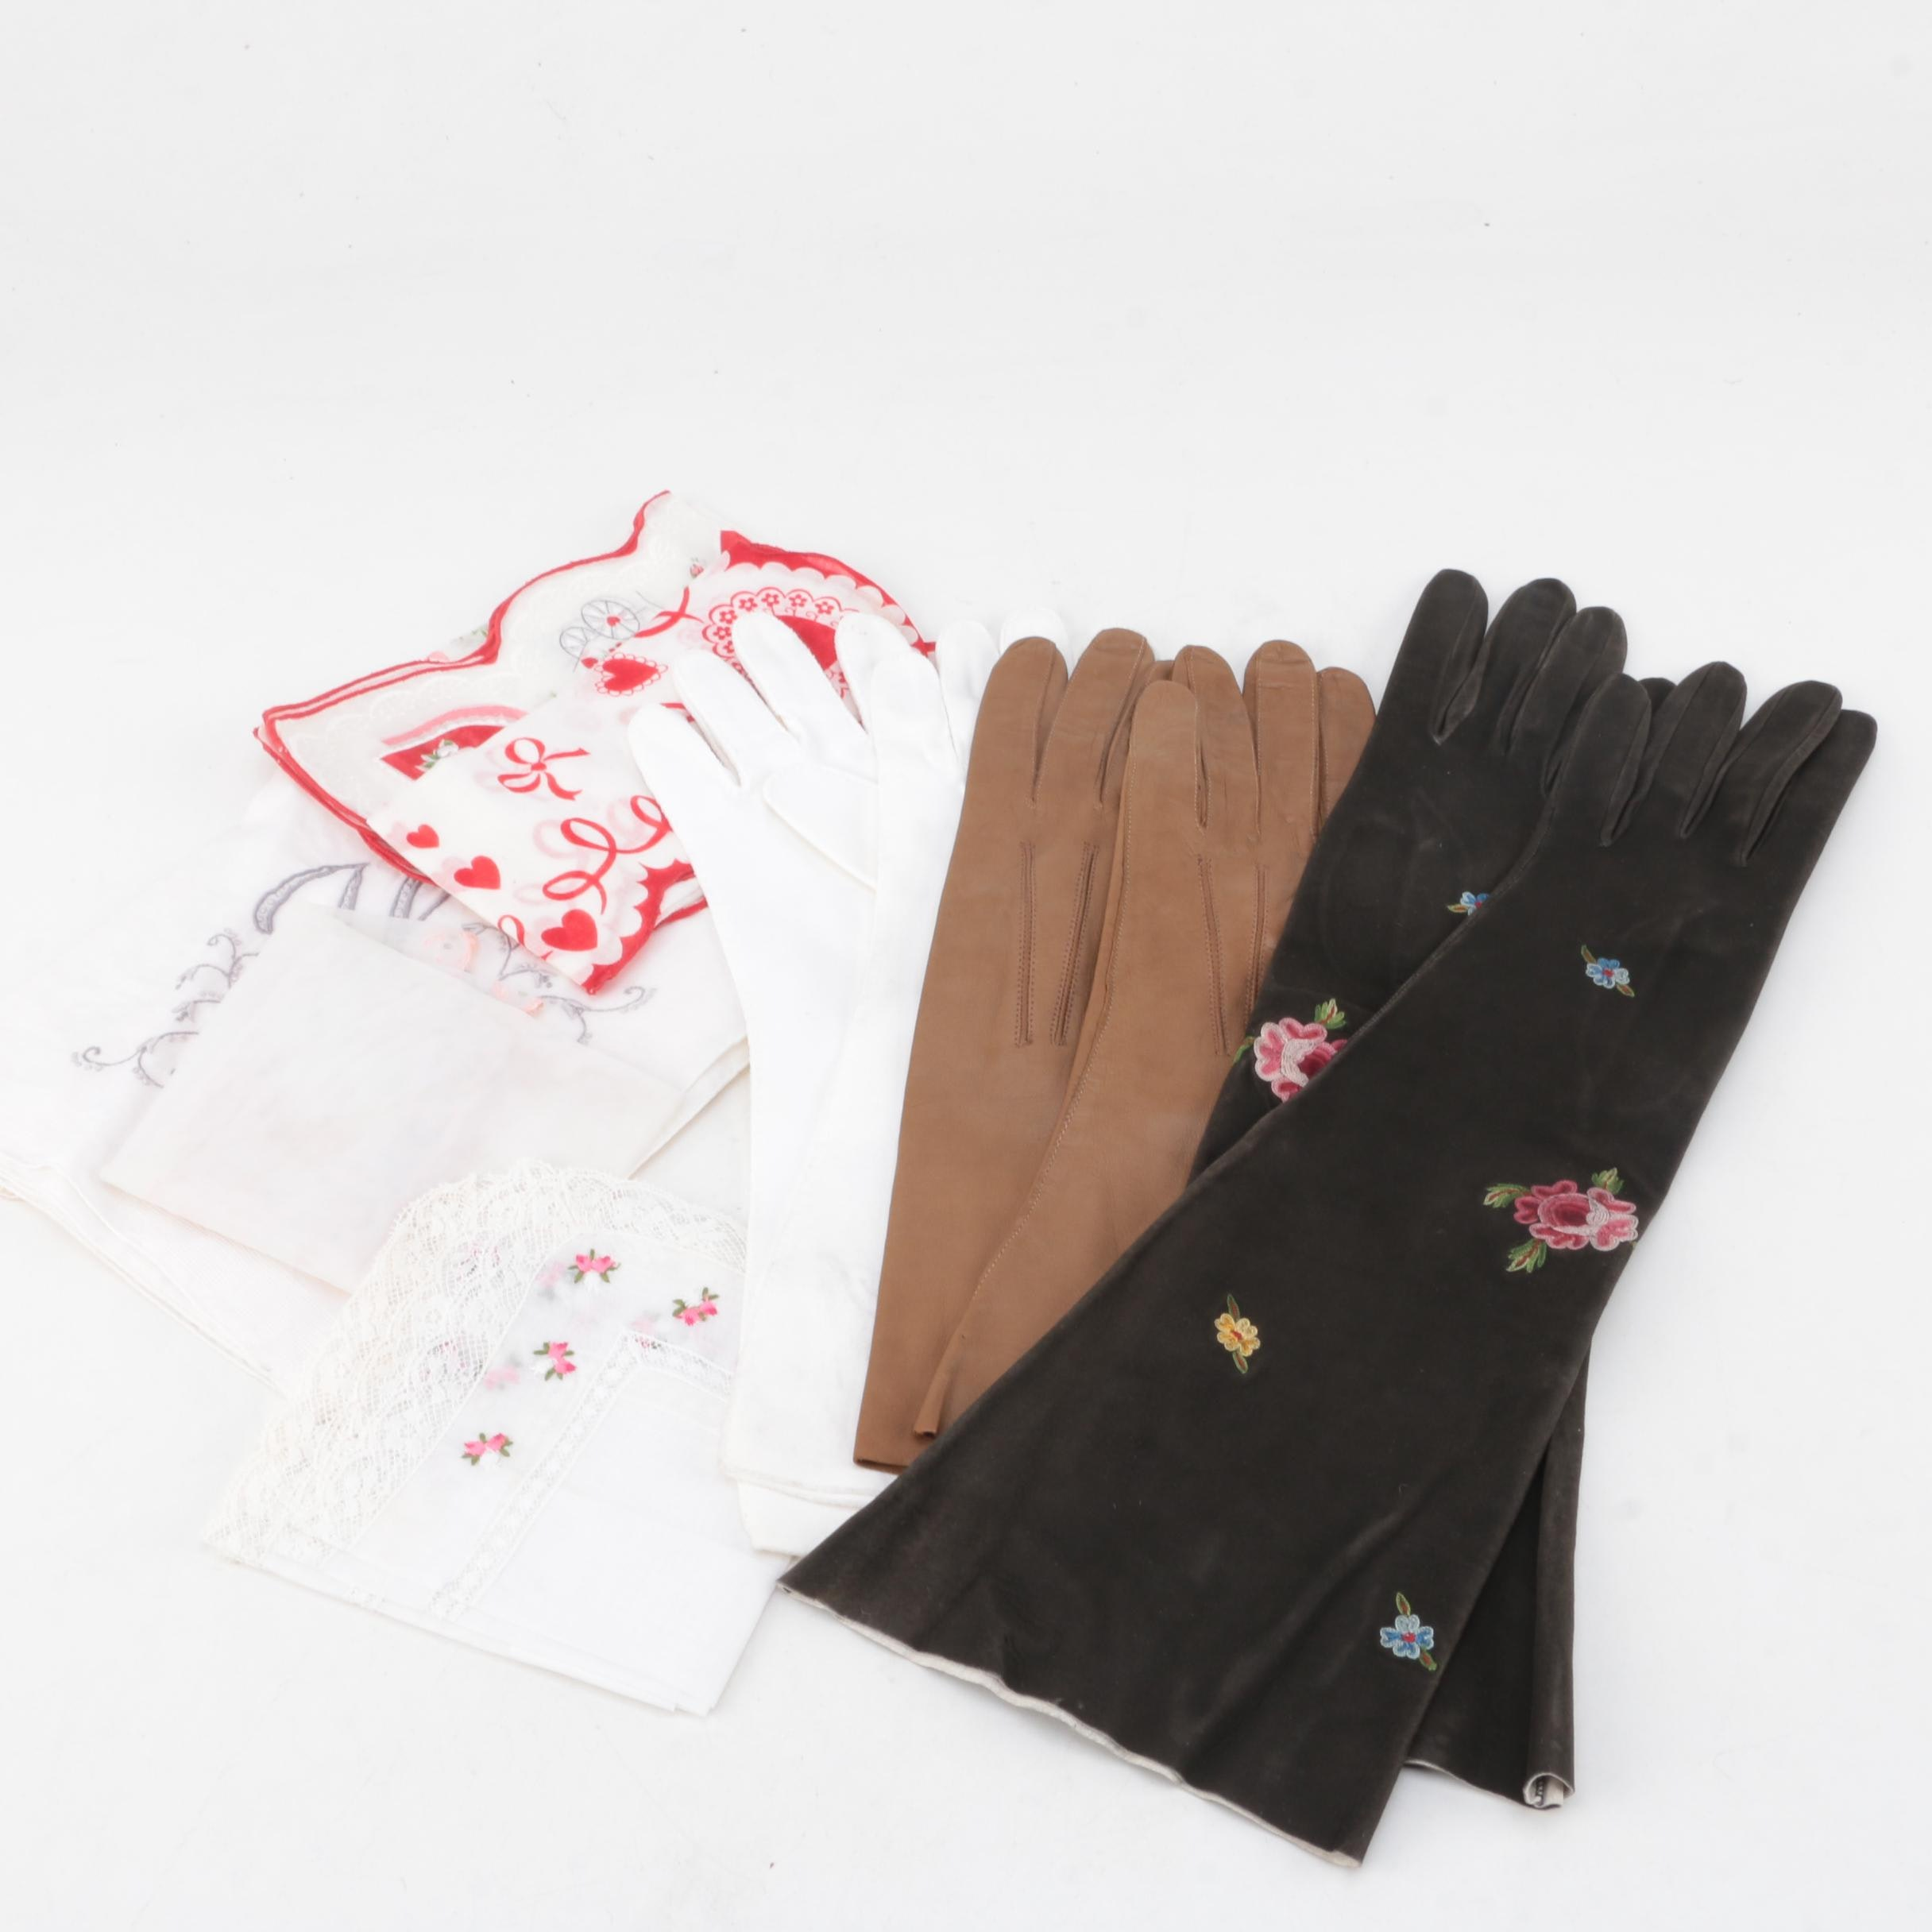 Women's Vintage Gloves and Handkerchiefs